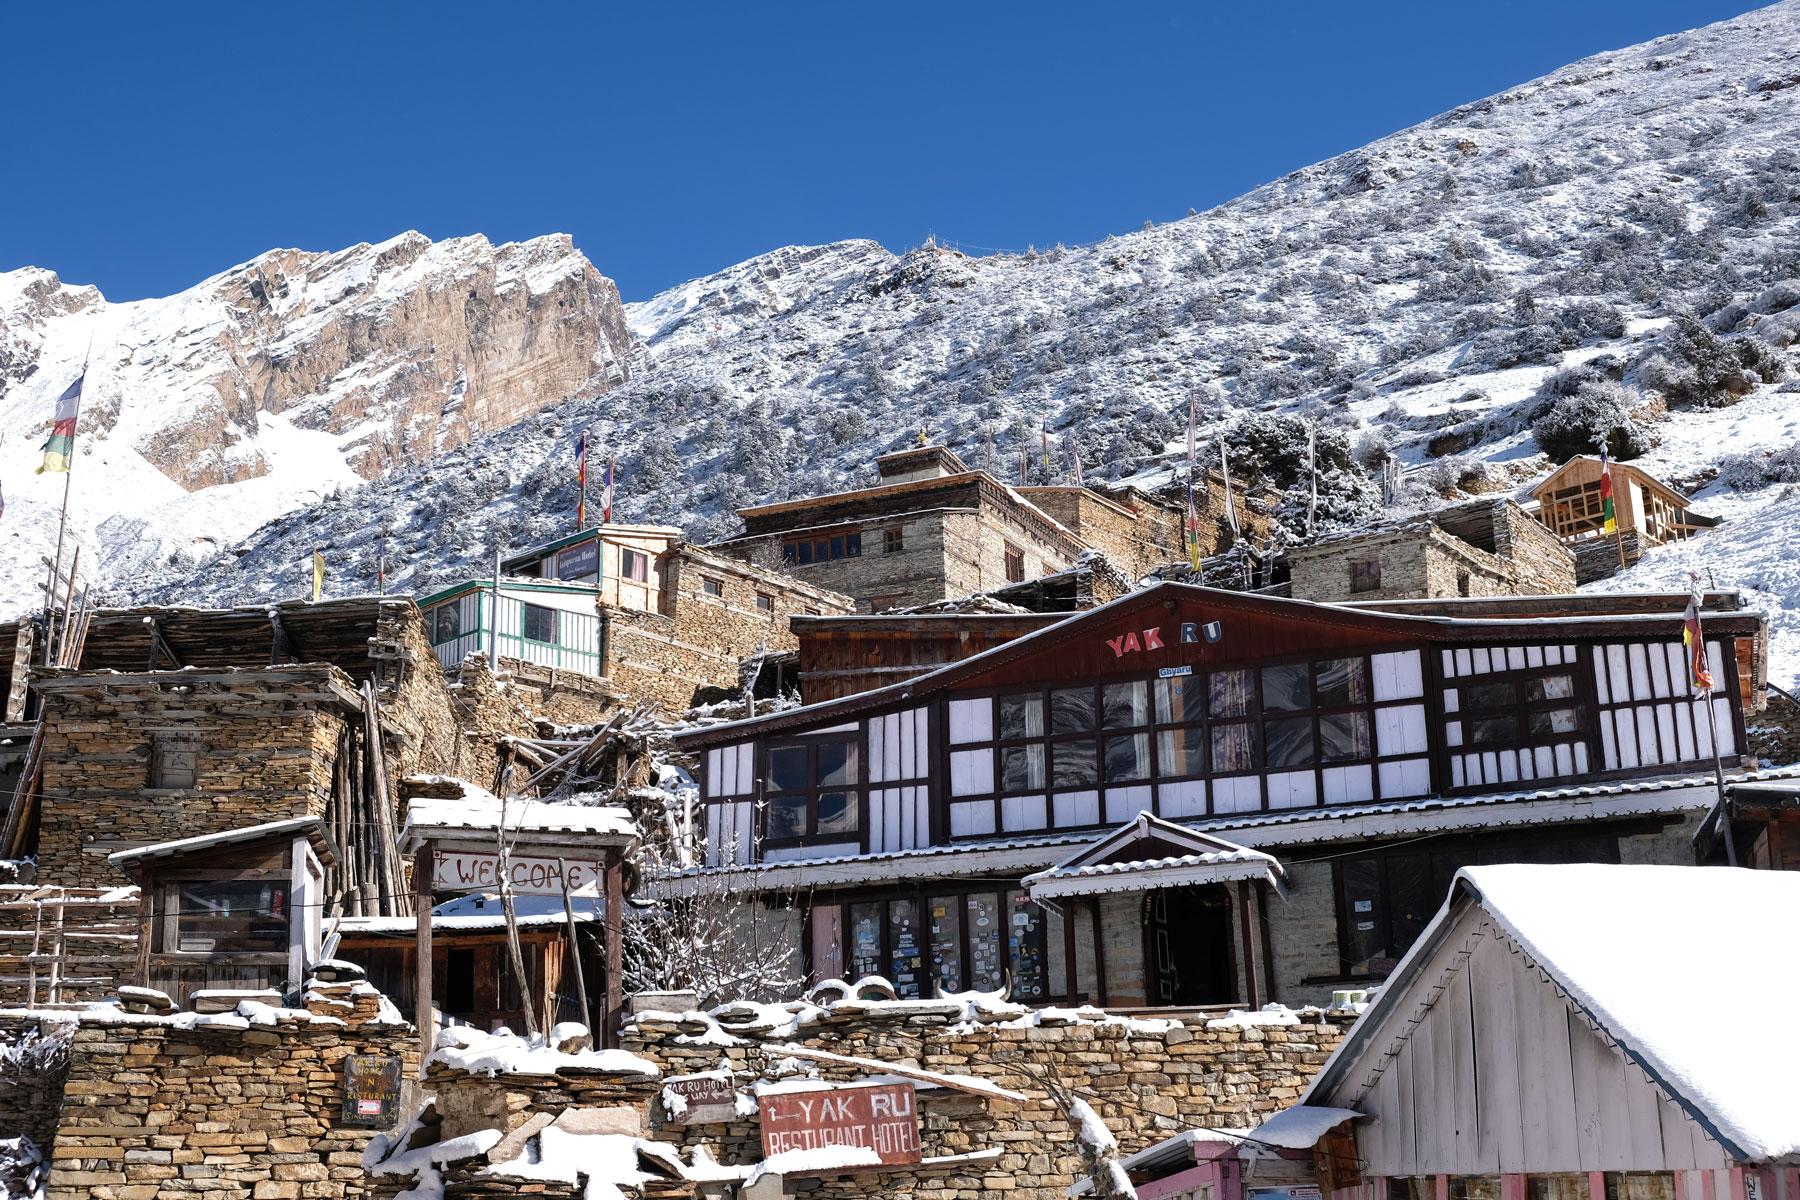 Häuser des Dorfs Ghyaru auf dem Annapurna Circuit.